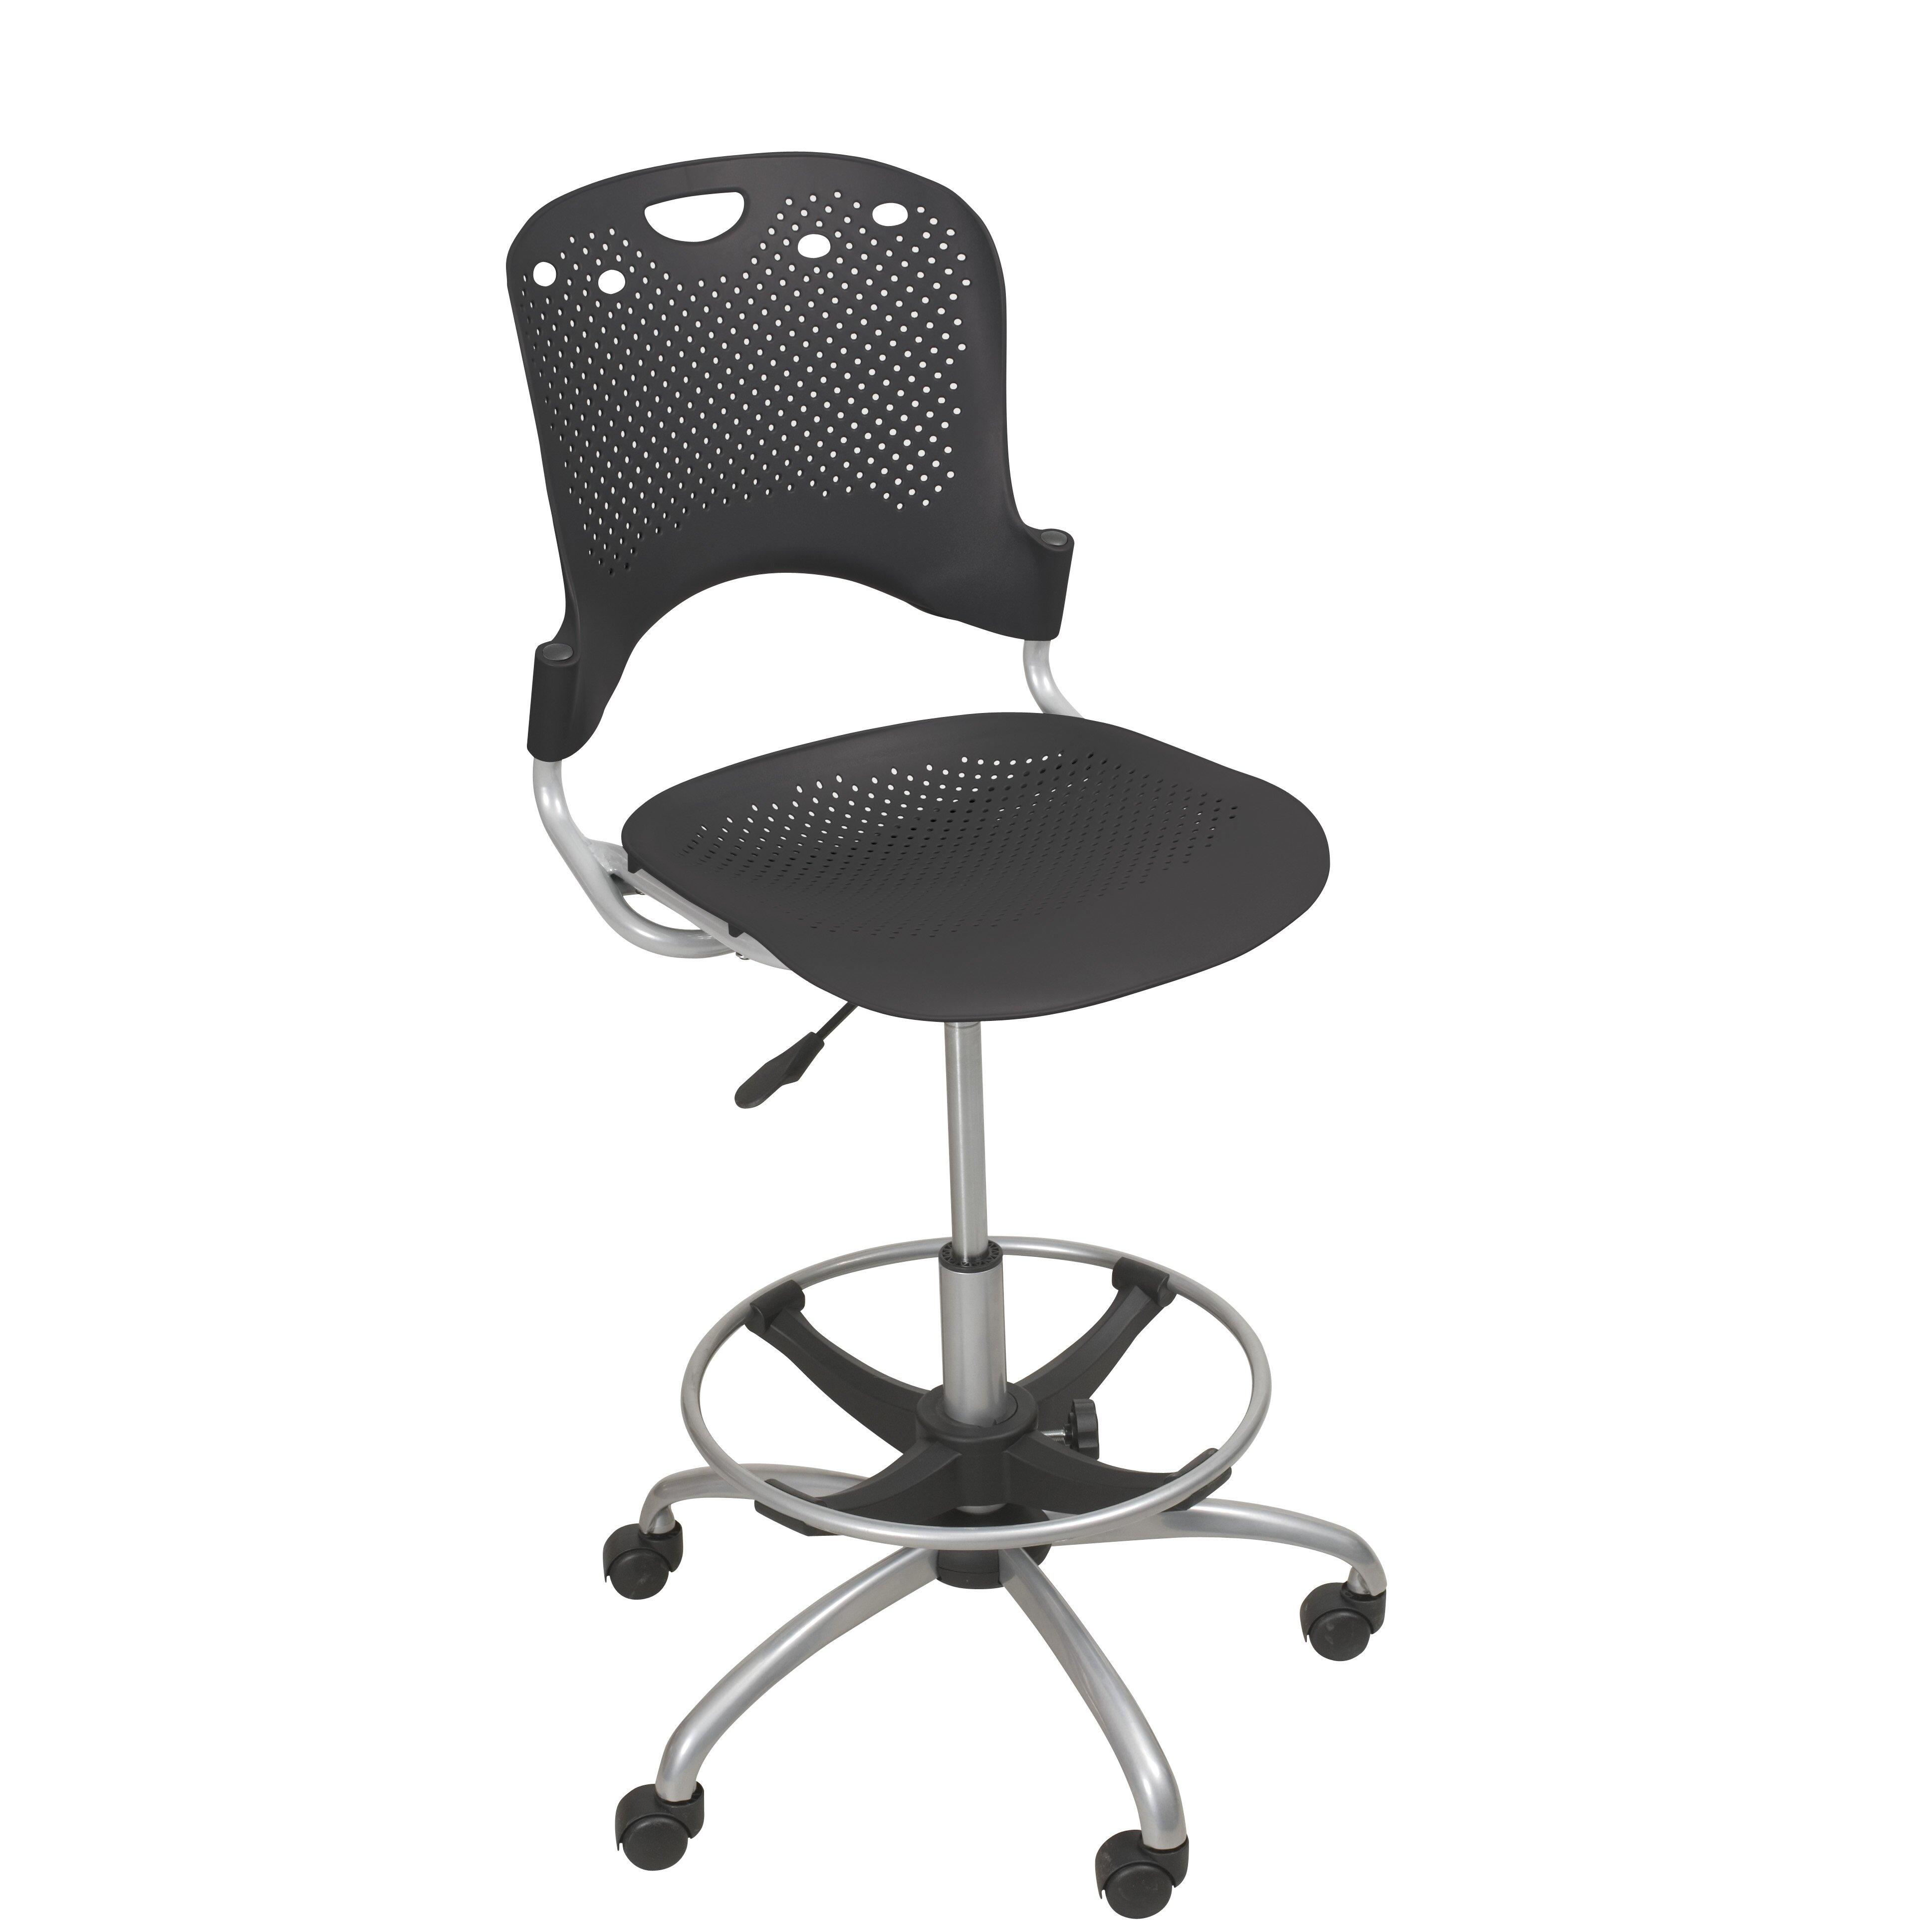 Balt Circulation Drafting Chair Amp Reviews Wayfair Supply